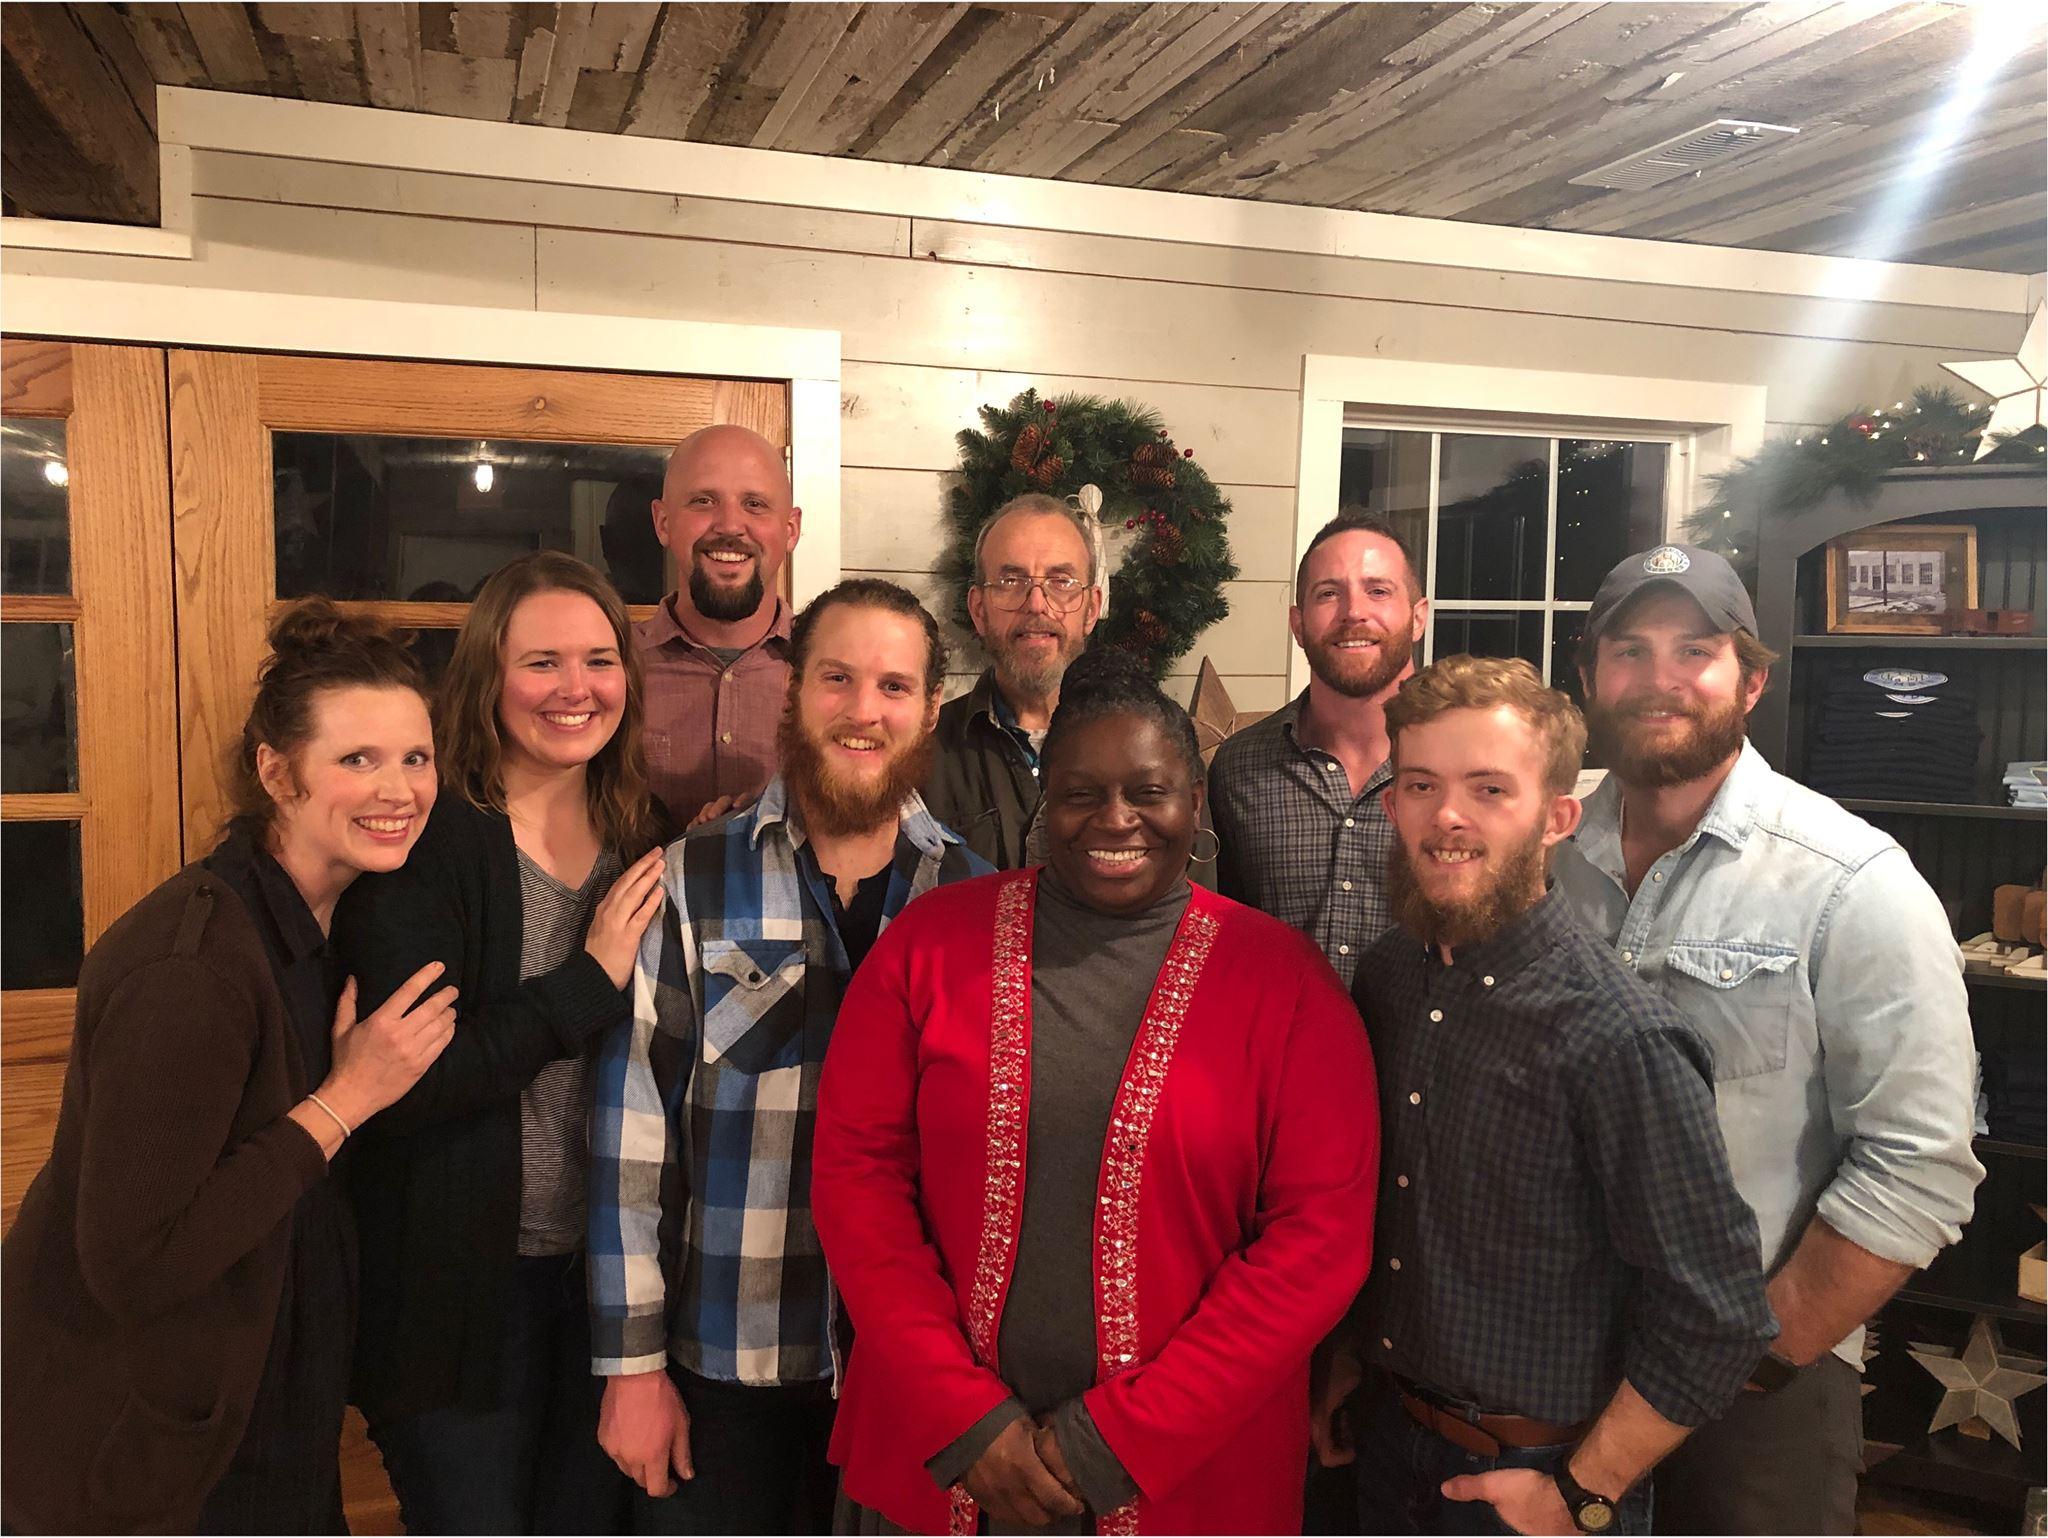 Kentucky Lumber team of employees